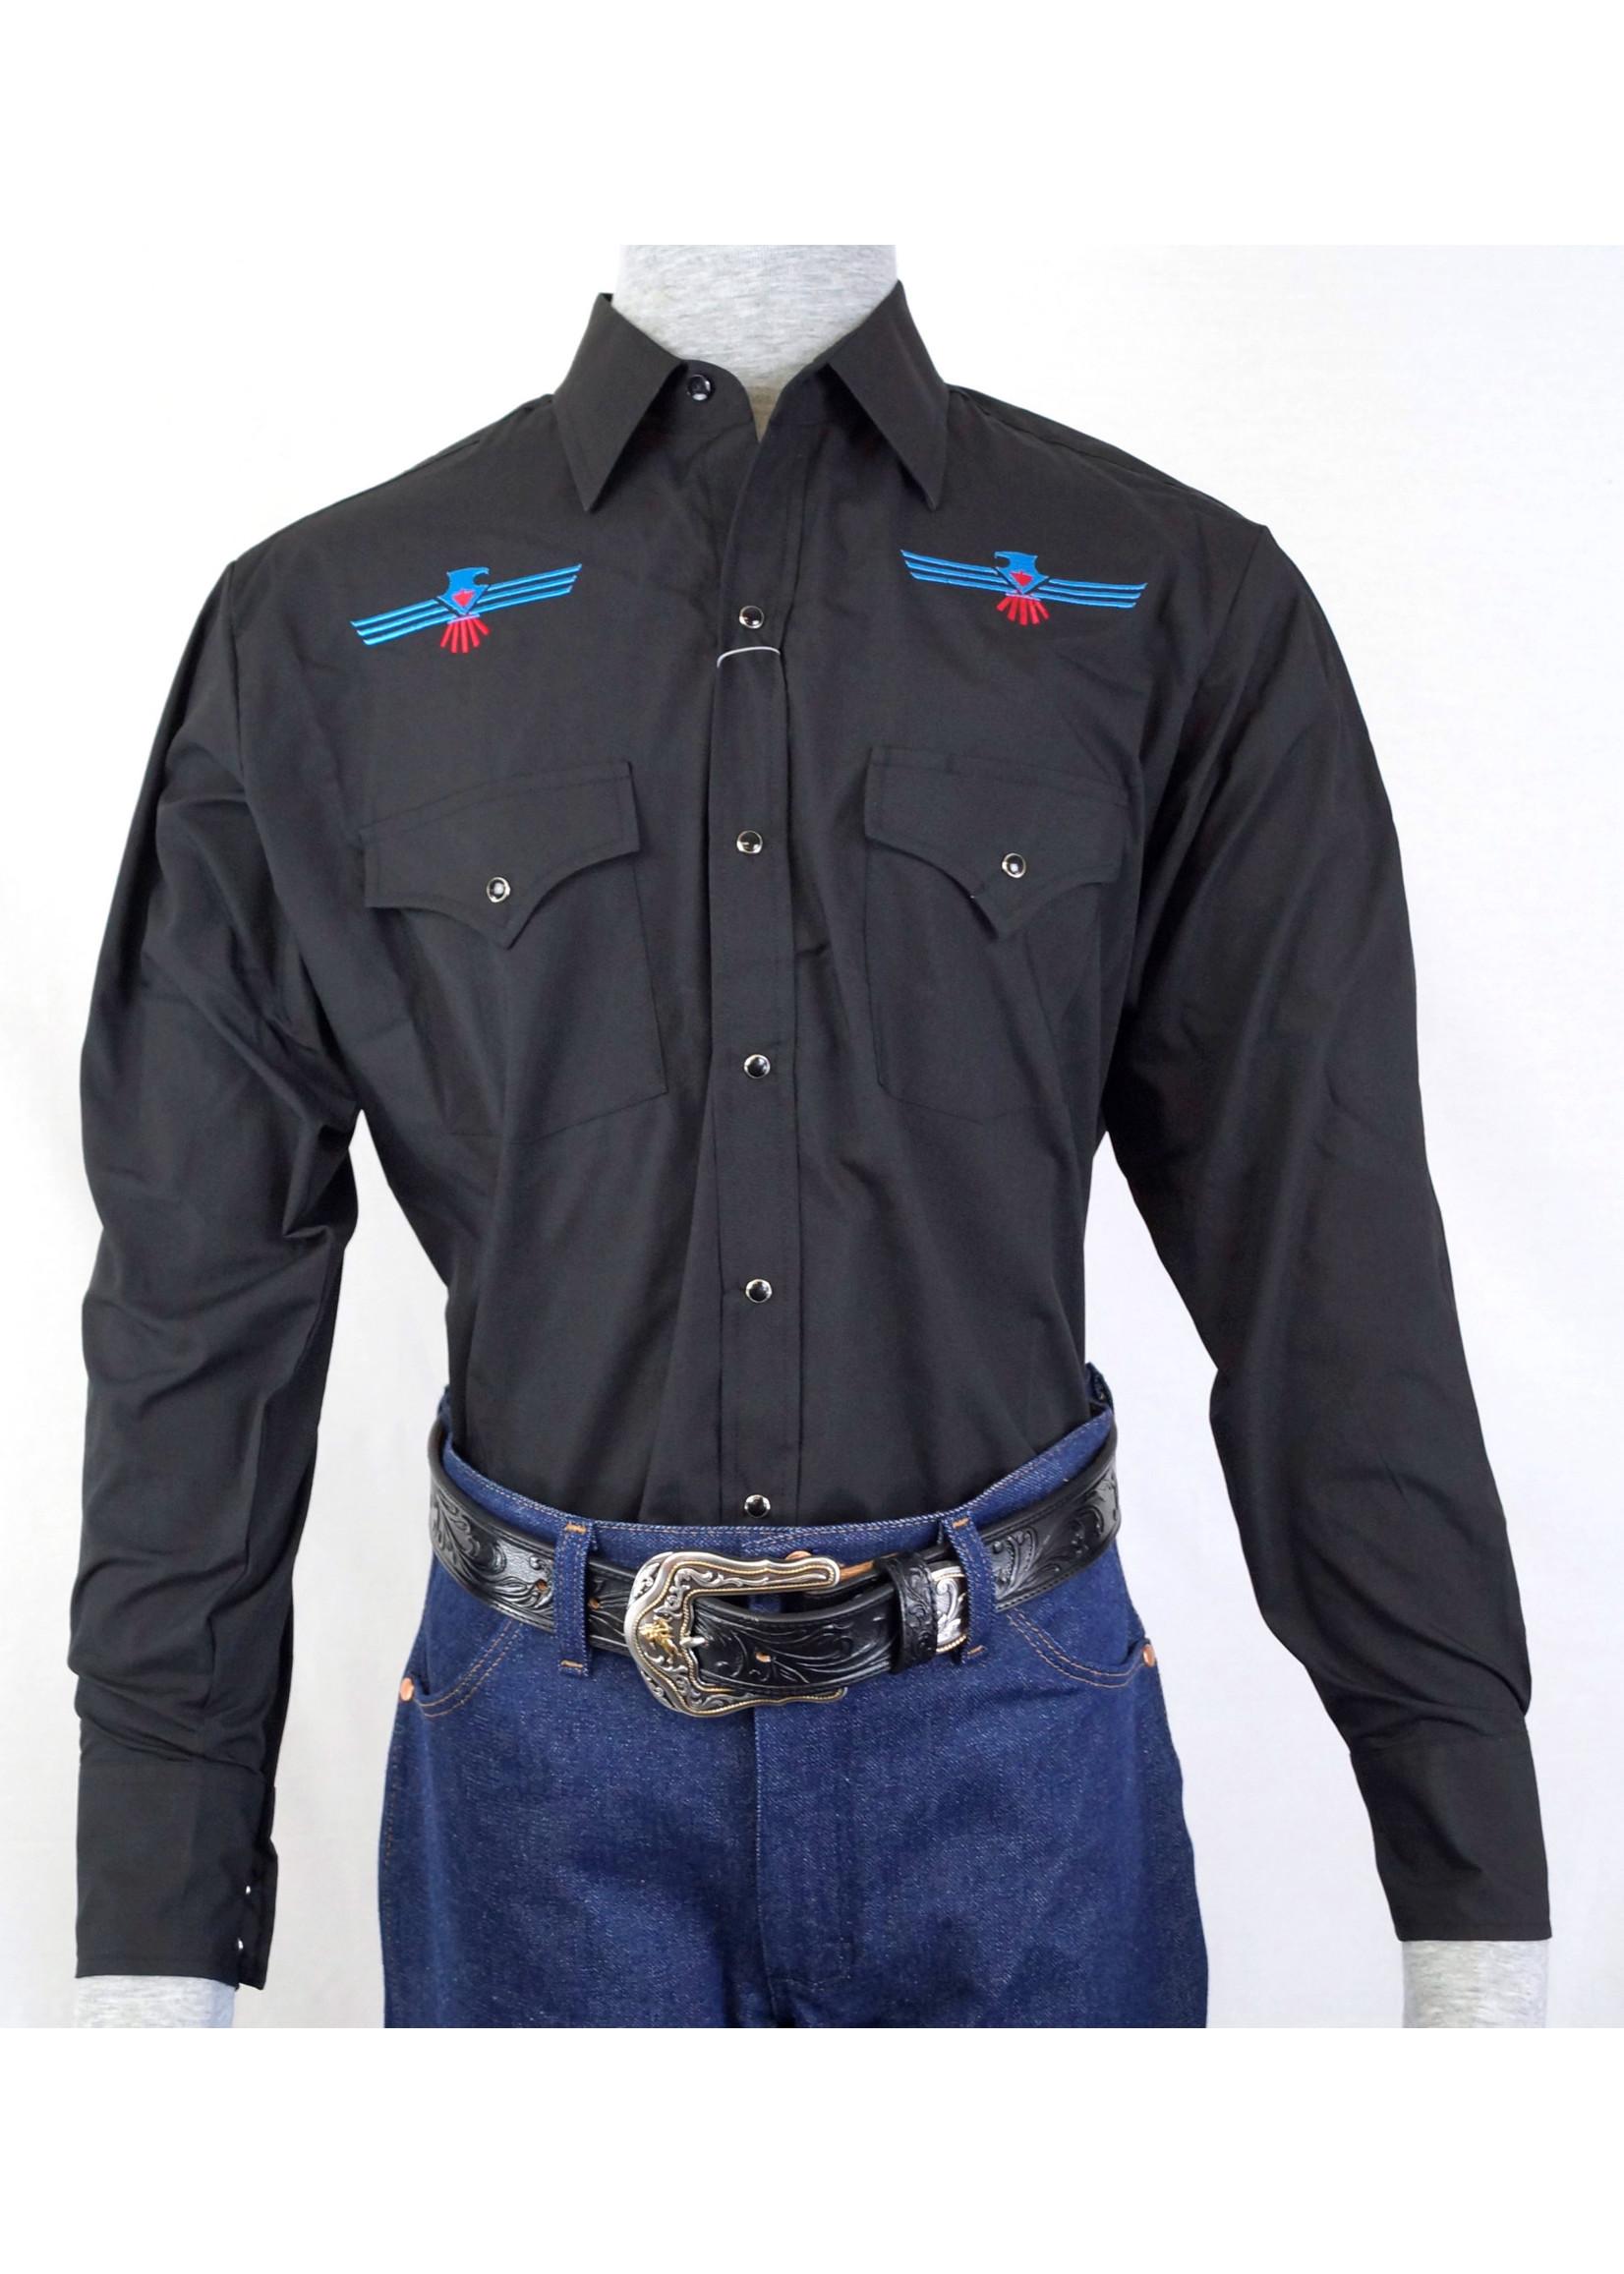 Ely Men's Black with Aztec Eagle Emblem Shirt 15203955-89